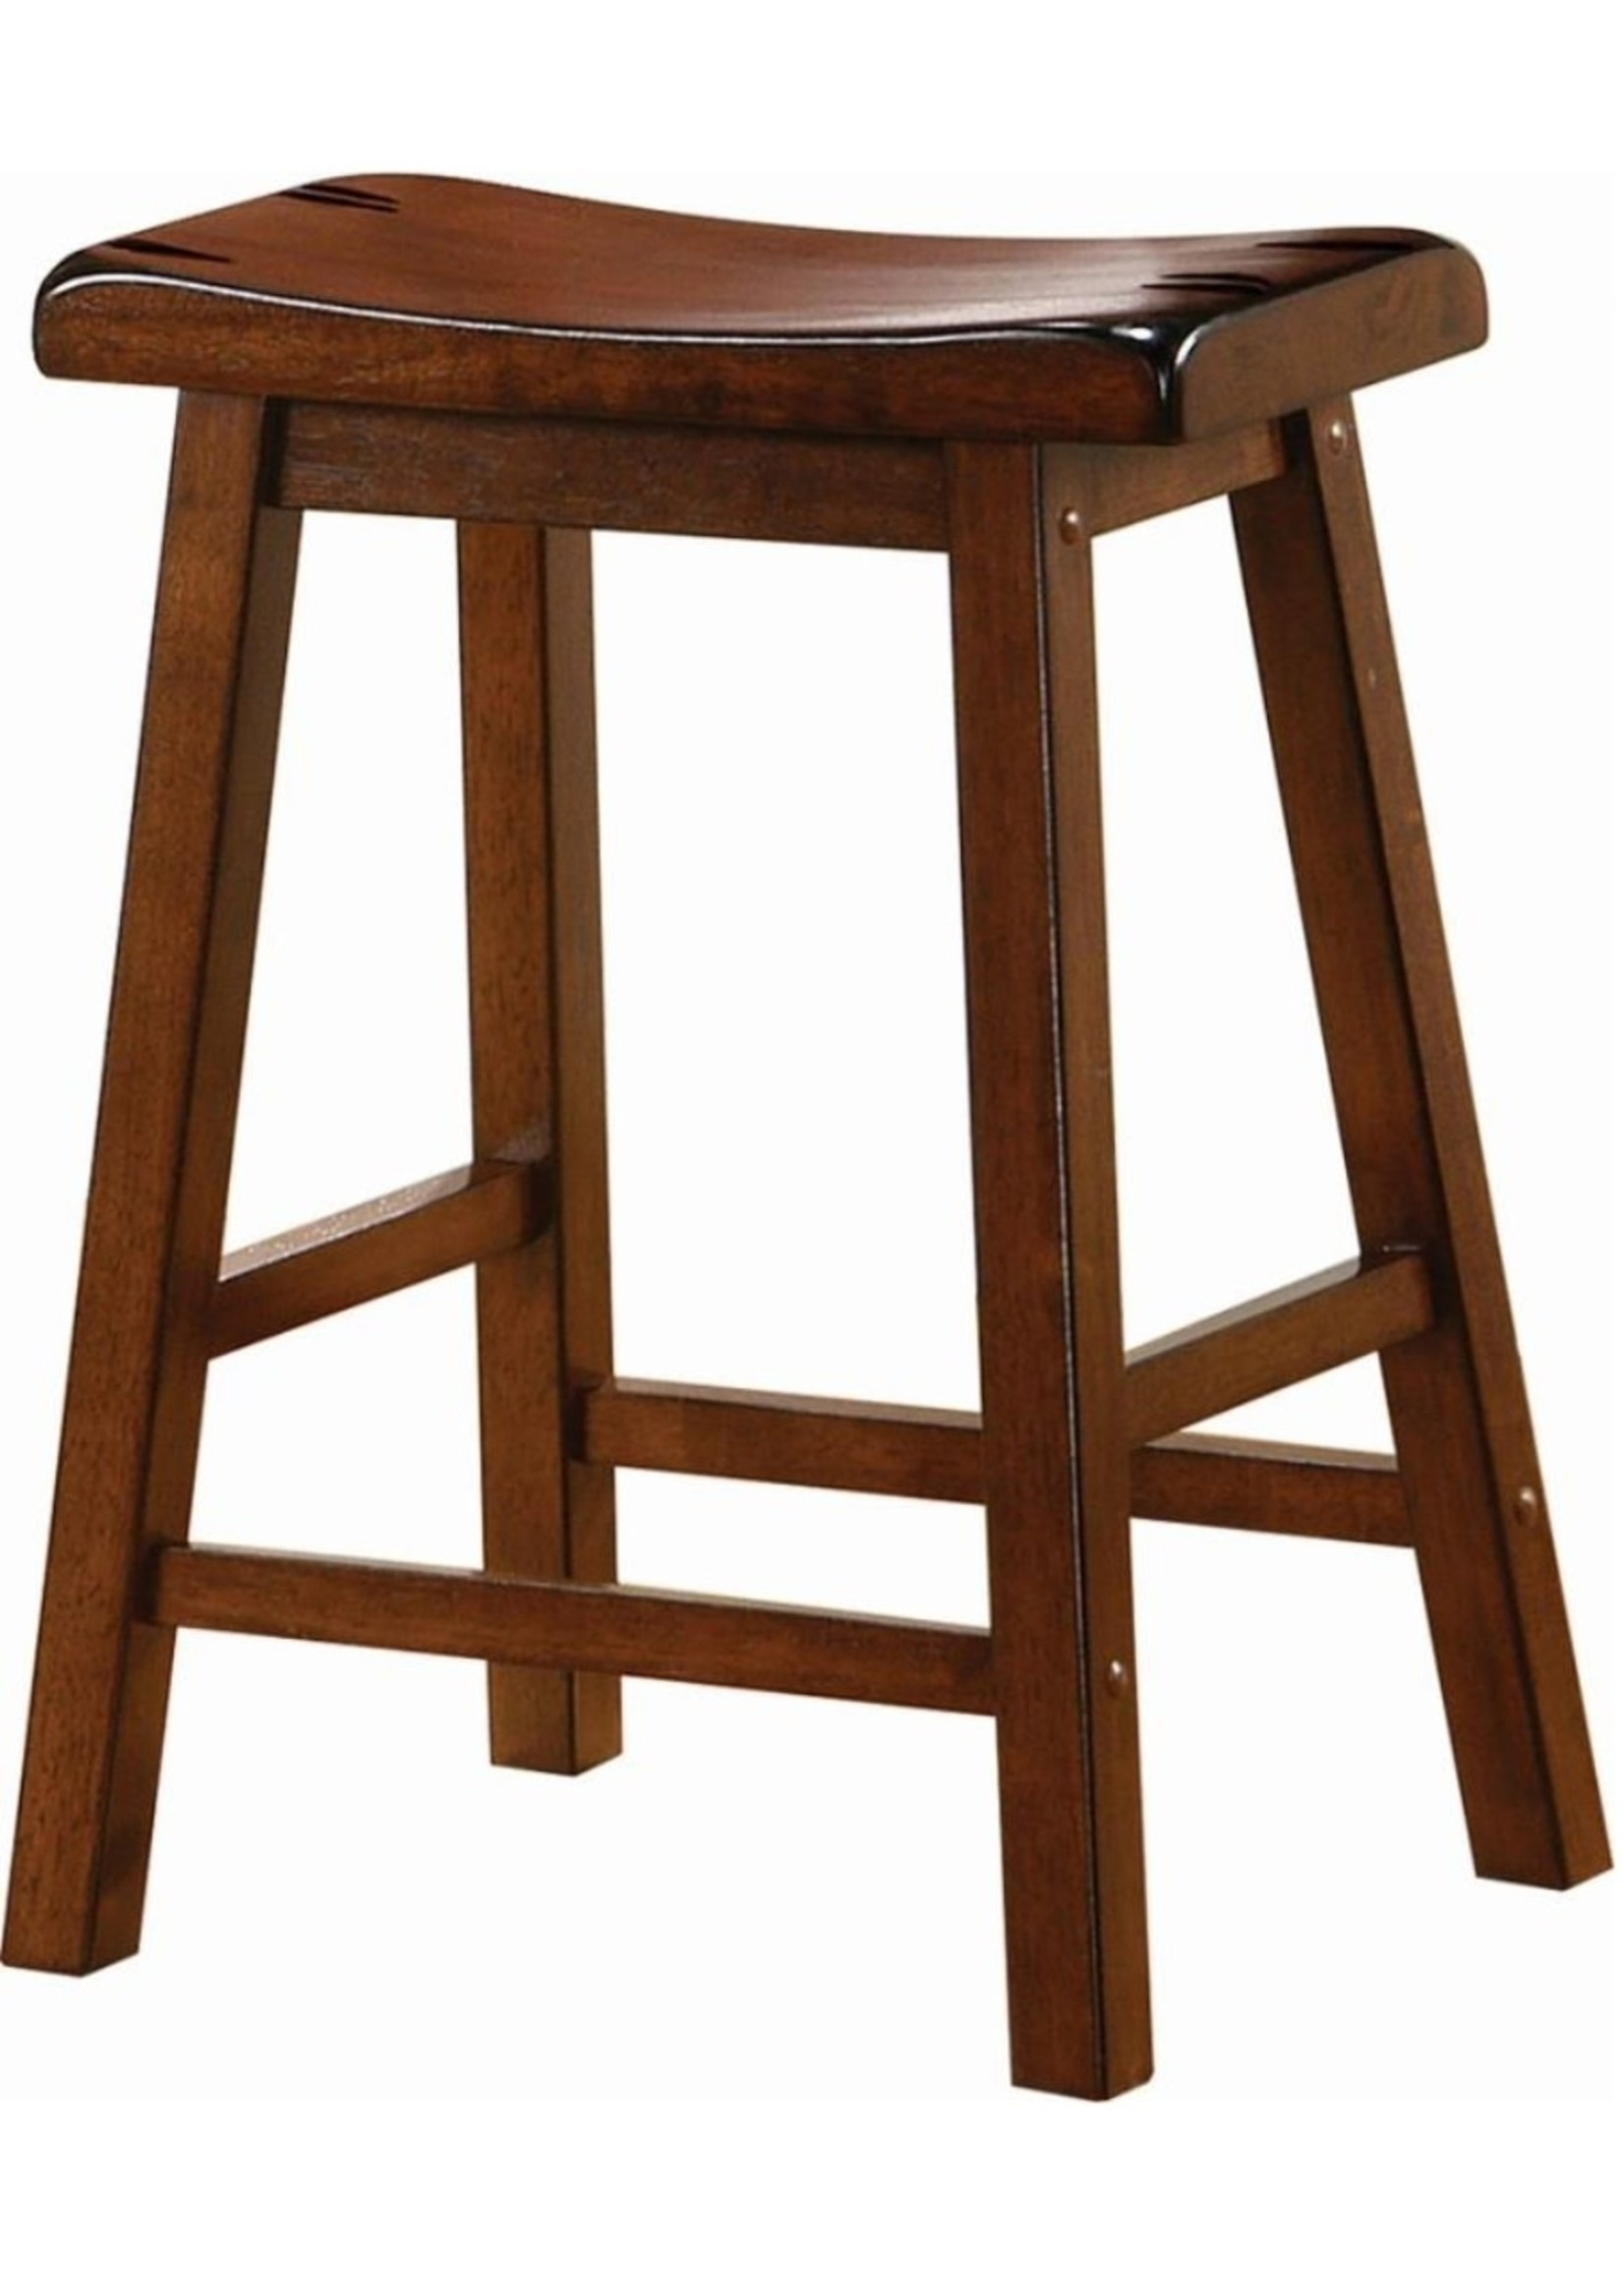 "COASTER 180069 STOOL 24"" SADDLE SEAT CHESTNUT BROWN"